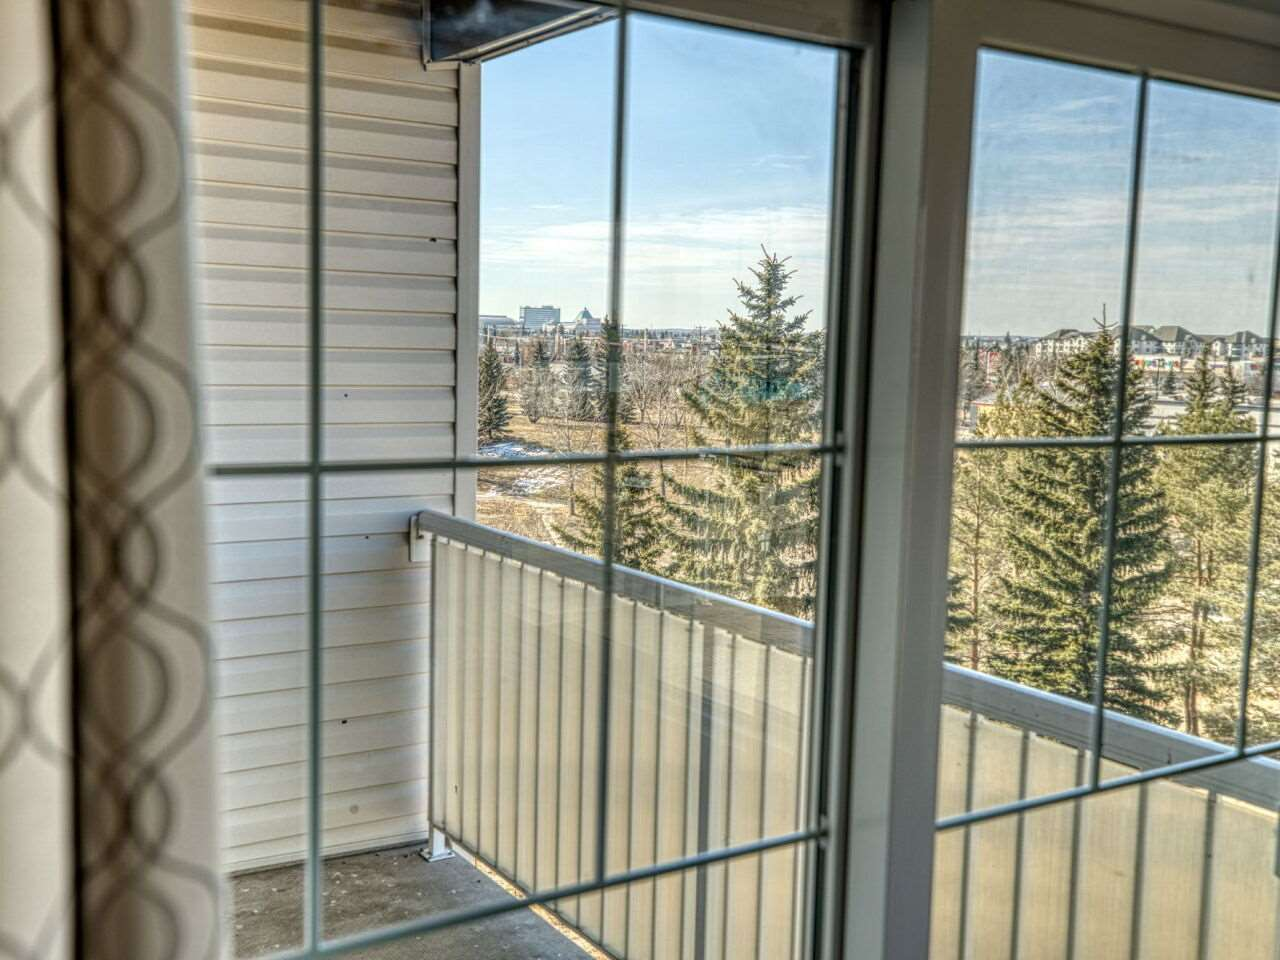 429 16807 100 Avenue - Glenwood_EDMO Lowrise Apartment for sale, 2 Bedrooms (E4234341) #14